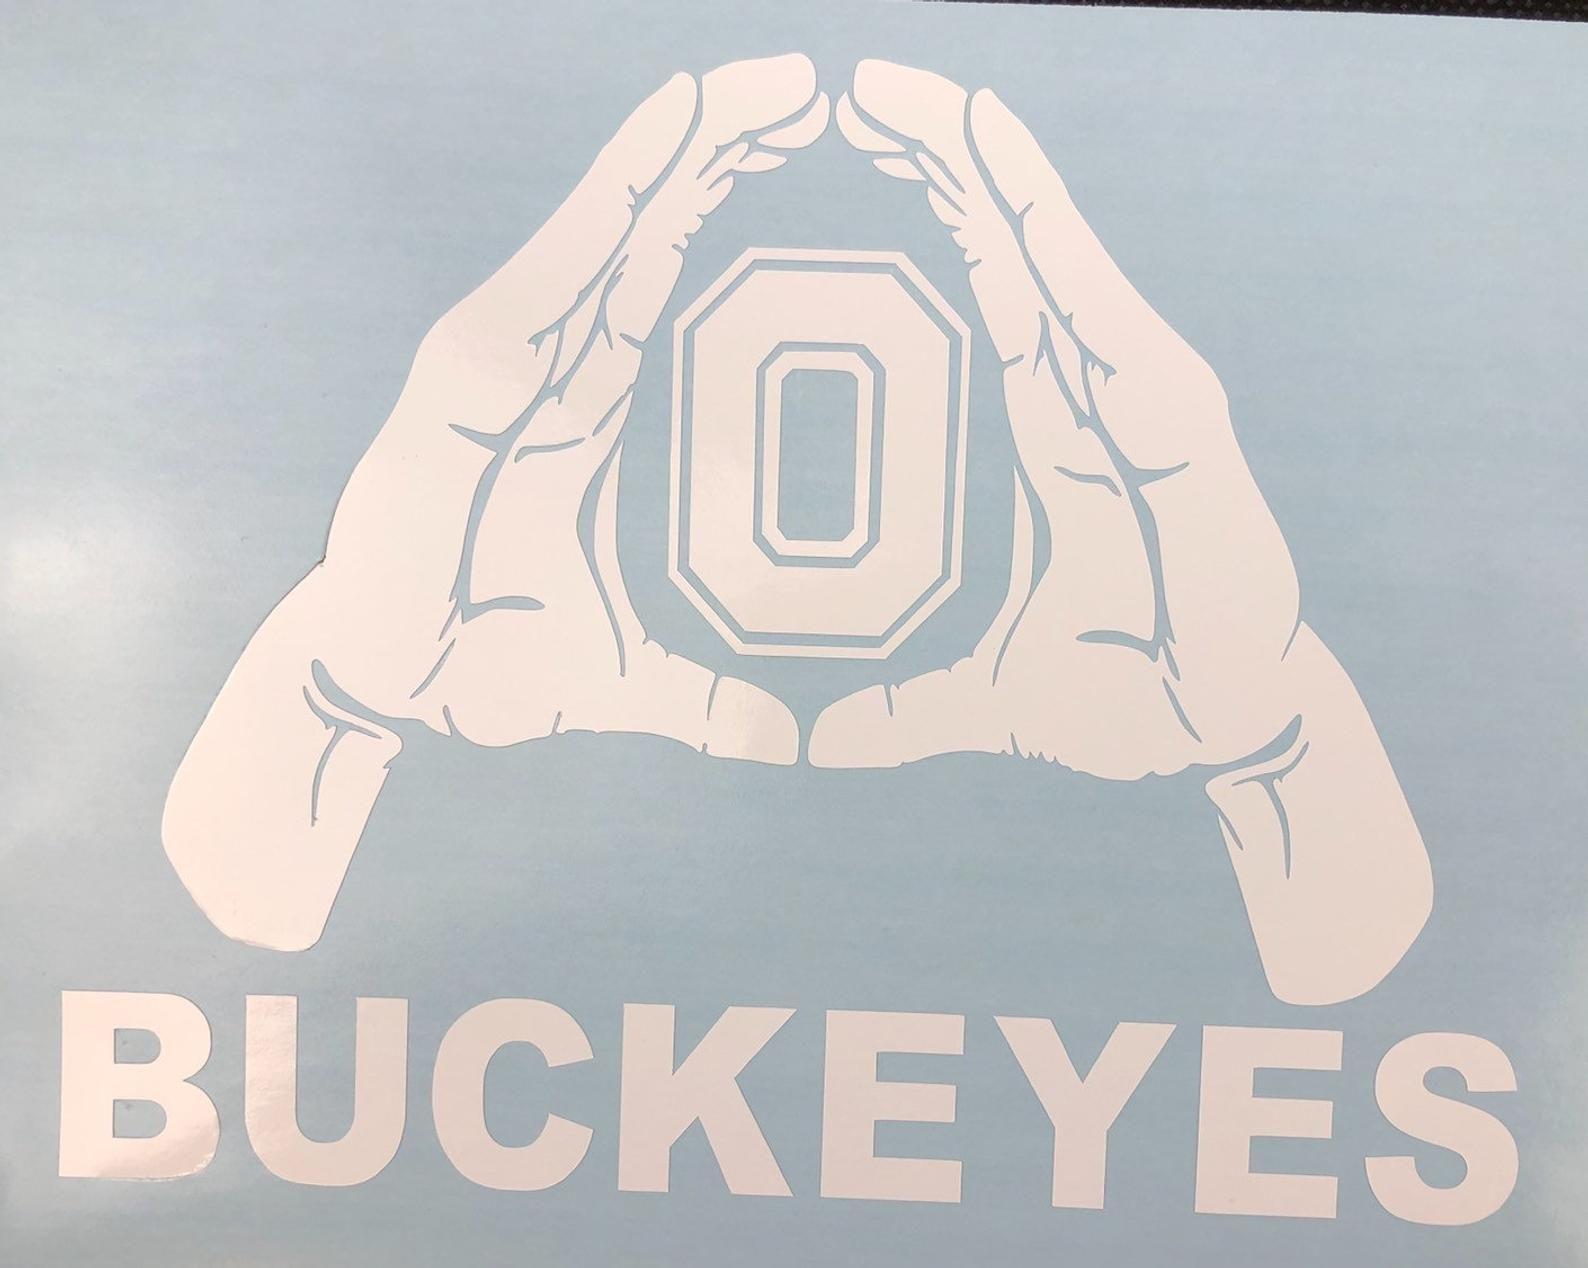 Ohio State Buckeyes Block O Hands White Vinyl Decal Etsy Ohio State Ohio State Buckeyes Buckeyes [ 1268 x 1588 Pixel ]